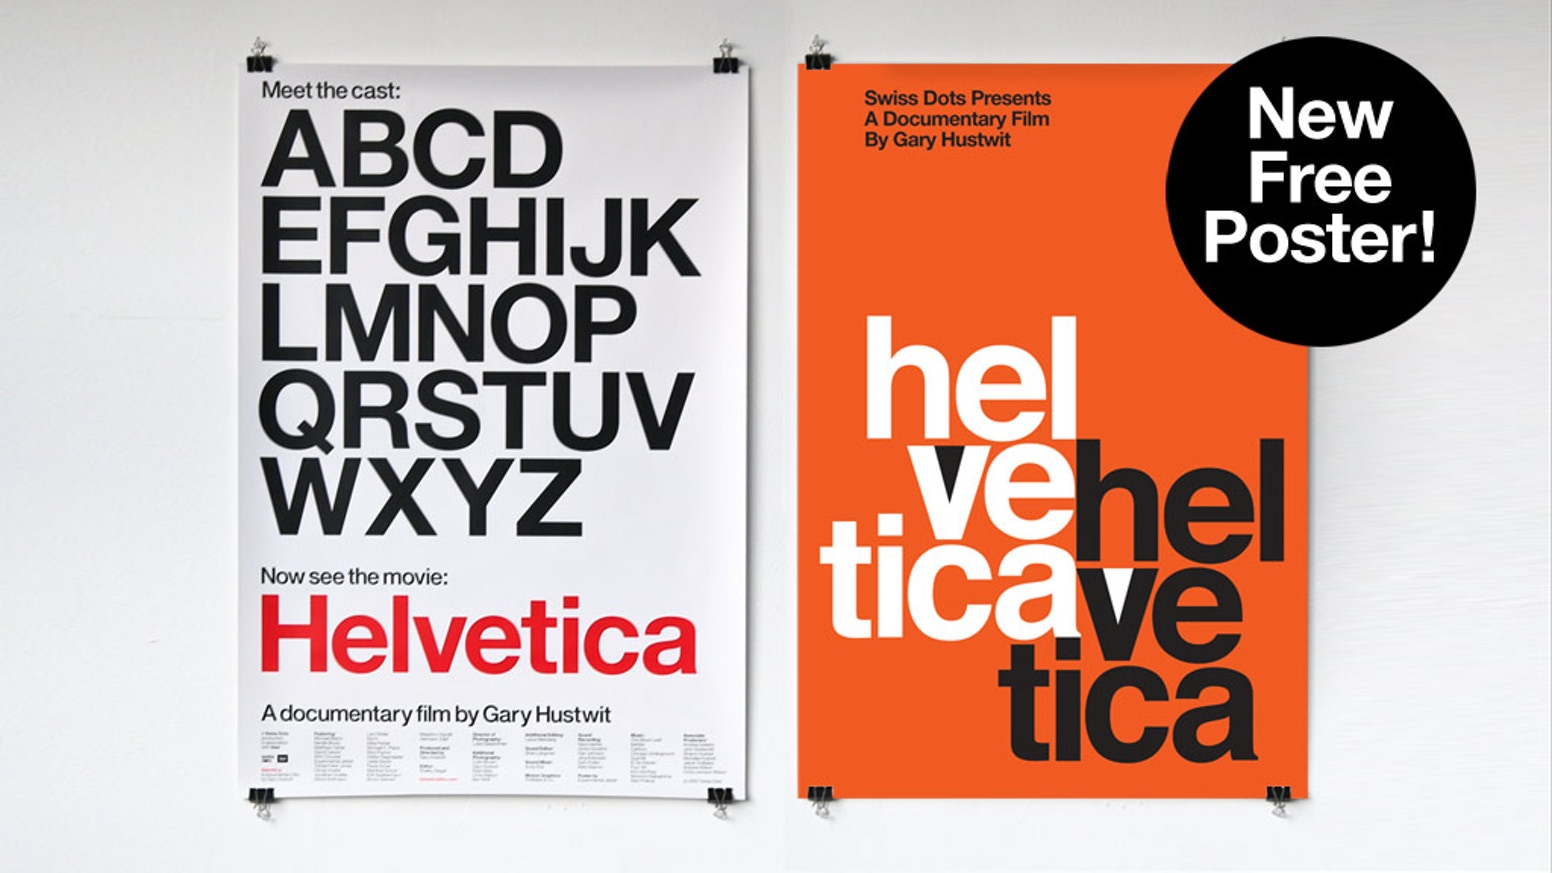 A reprint of the original Helvetica film poster designed by Experimental Jetset. Plus a new free bonus poster!